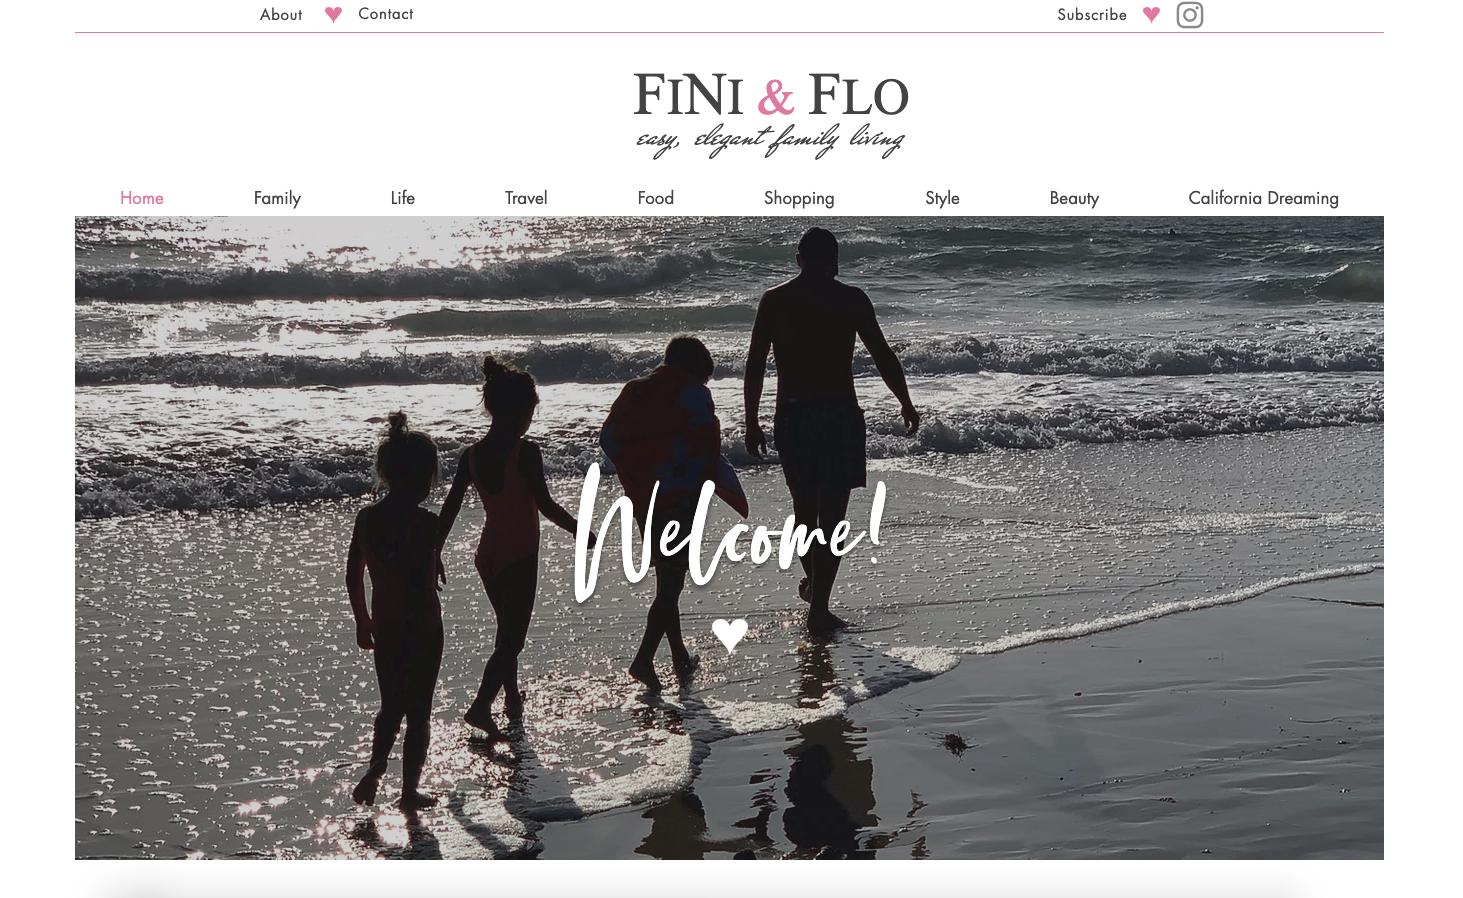 FiNi & Flow